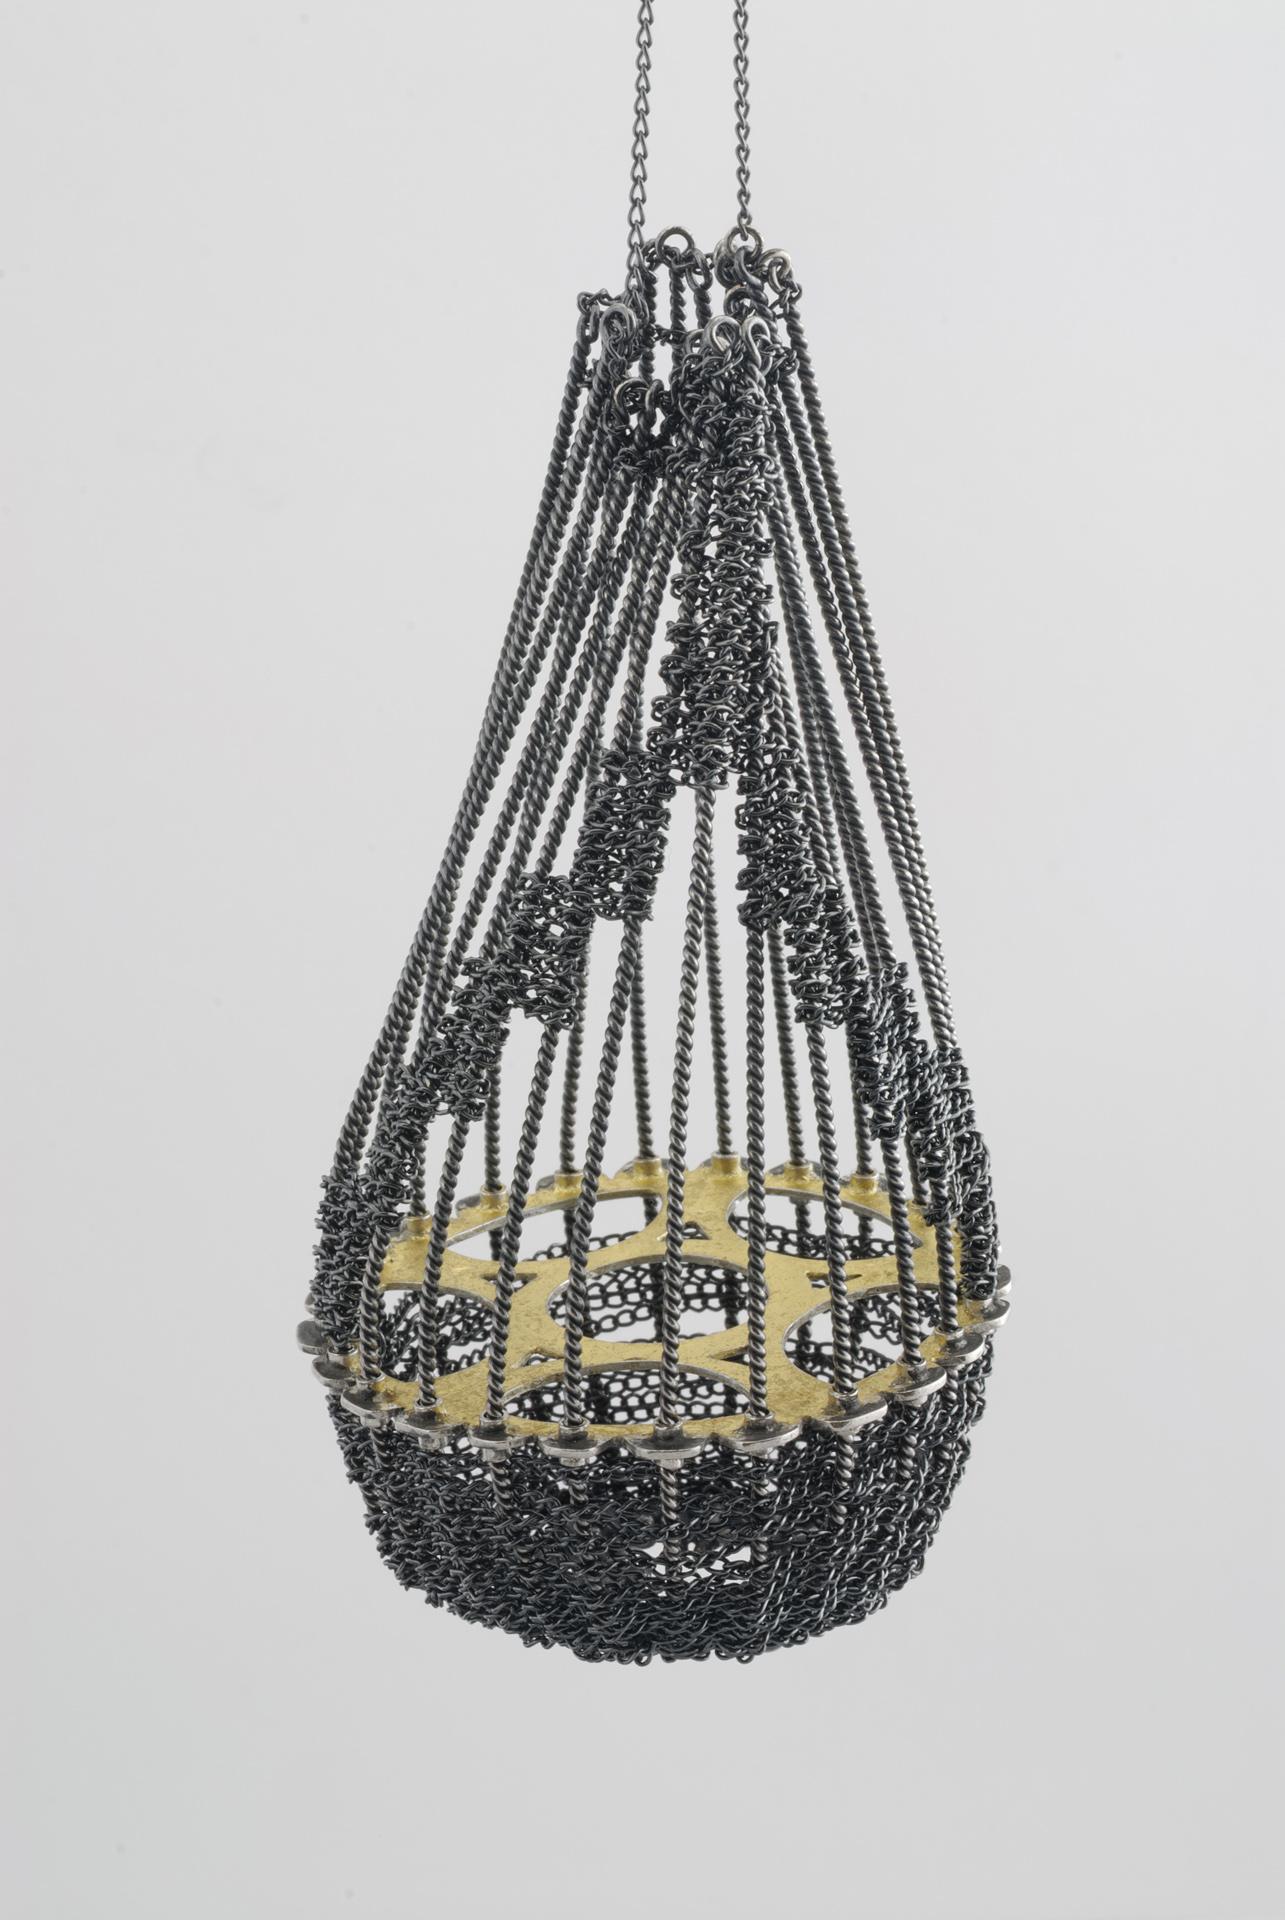 'Time Traveller' Necklace, oxidized stg silver, 24ct gold leaf, 85mm x 45mm